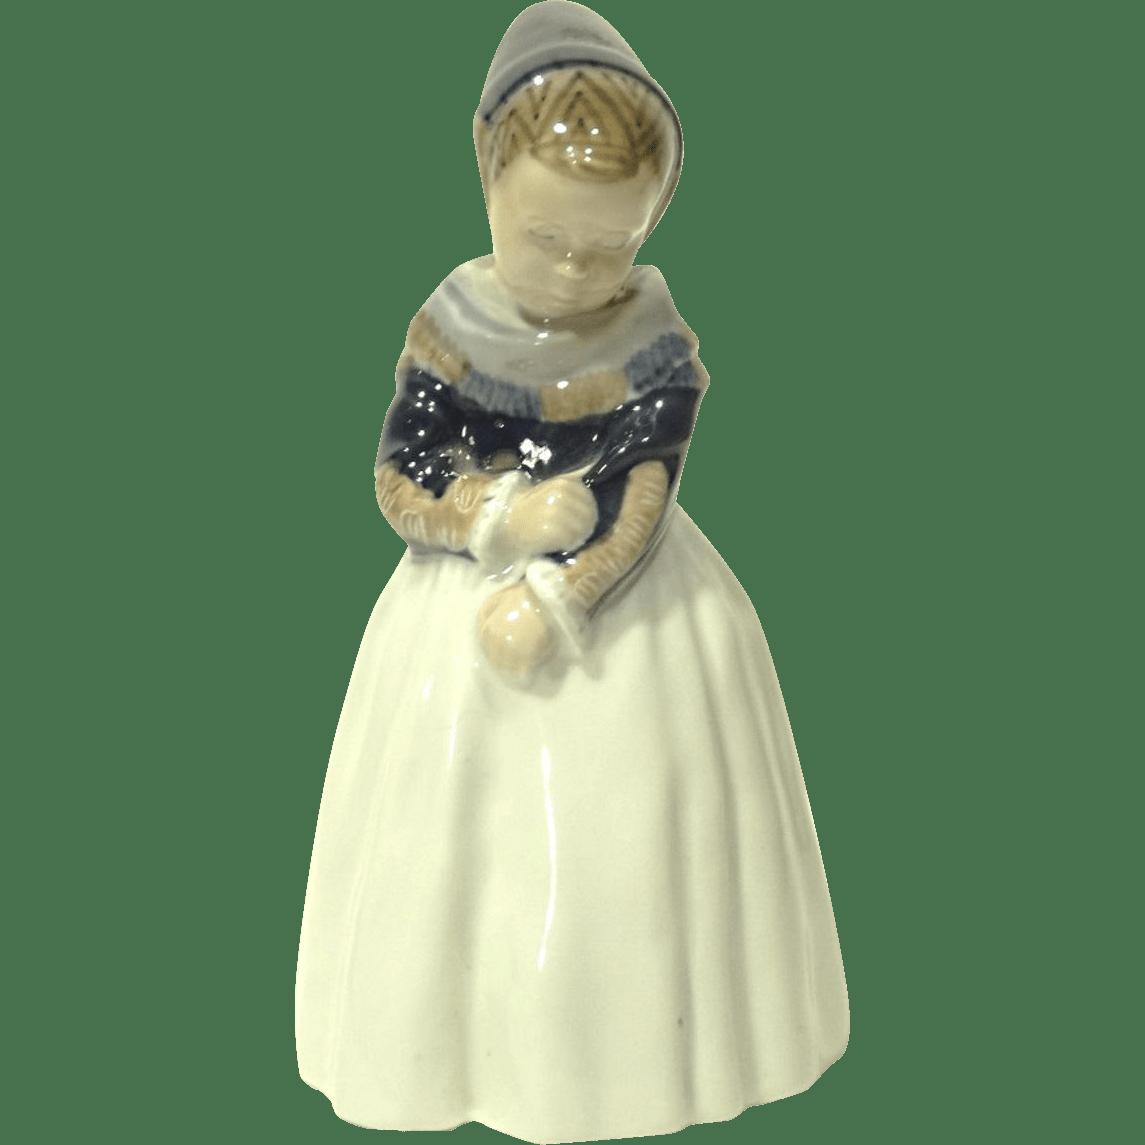 Vintage Royal Copenhagen Figurine Armager Girl 1251 From